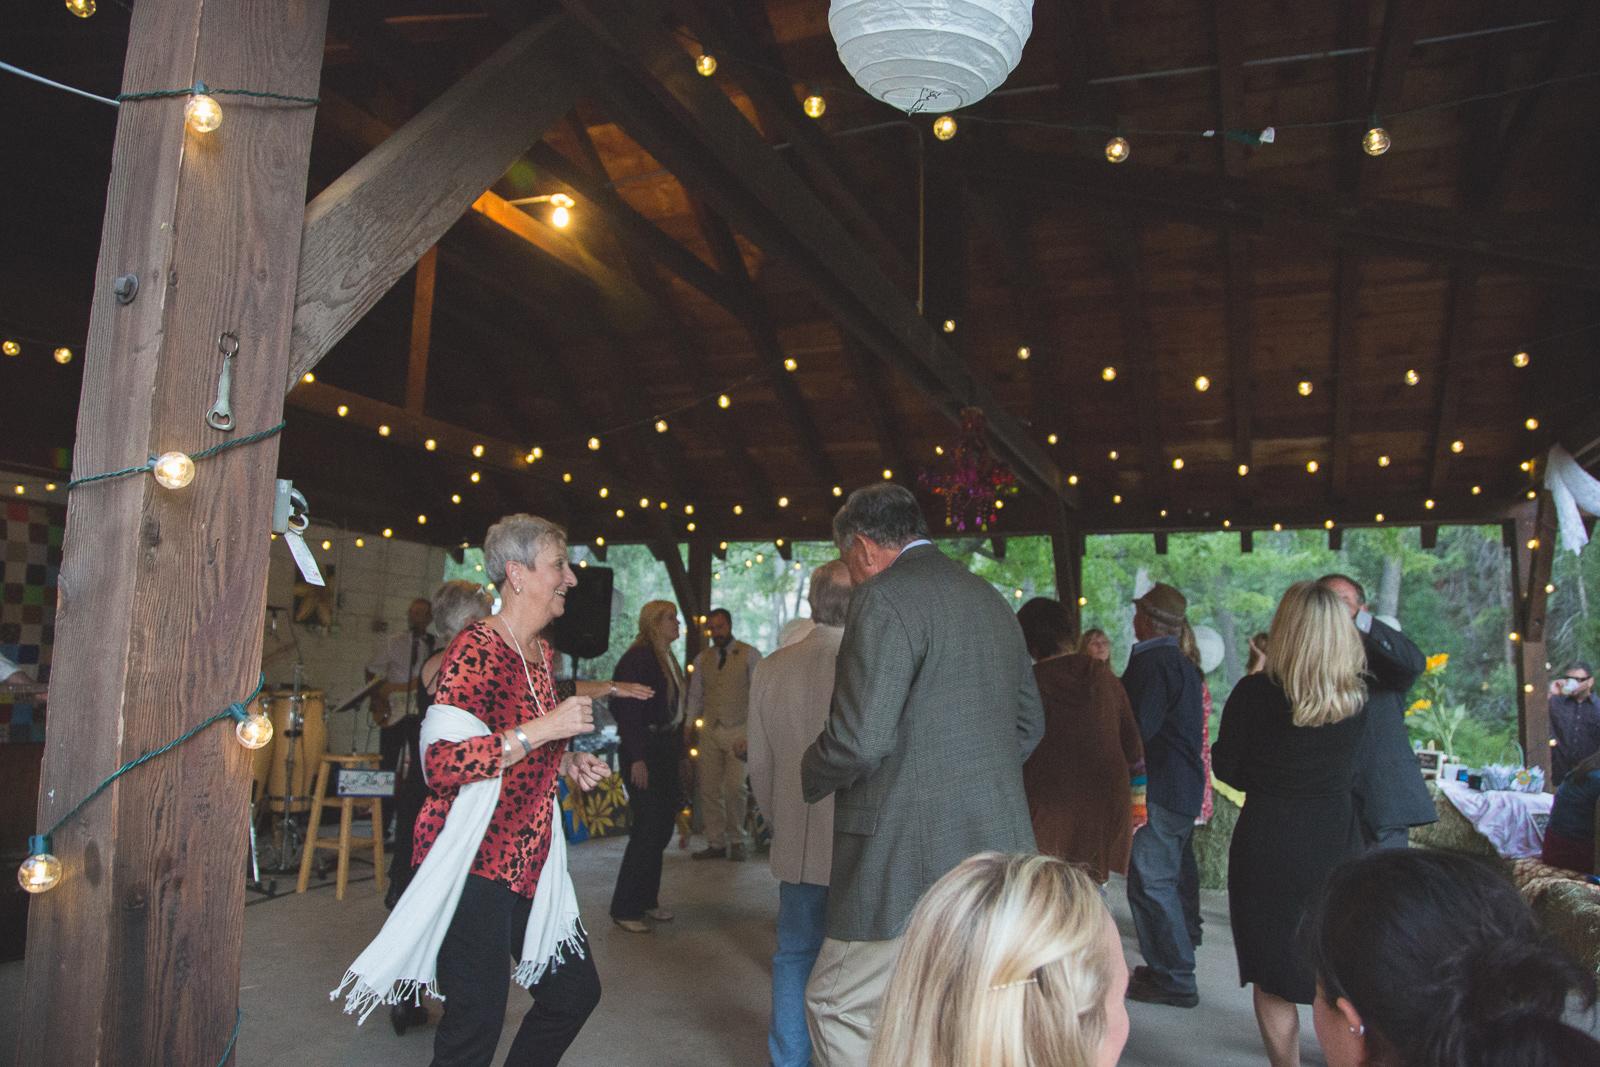 171-wedding-fun-photography-reception-unique-nature-trees-dancing